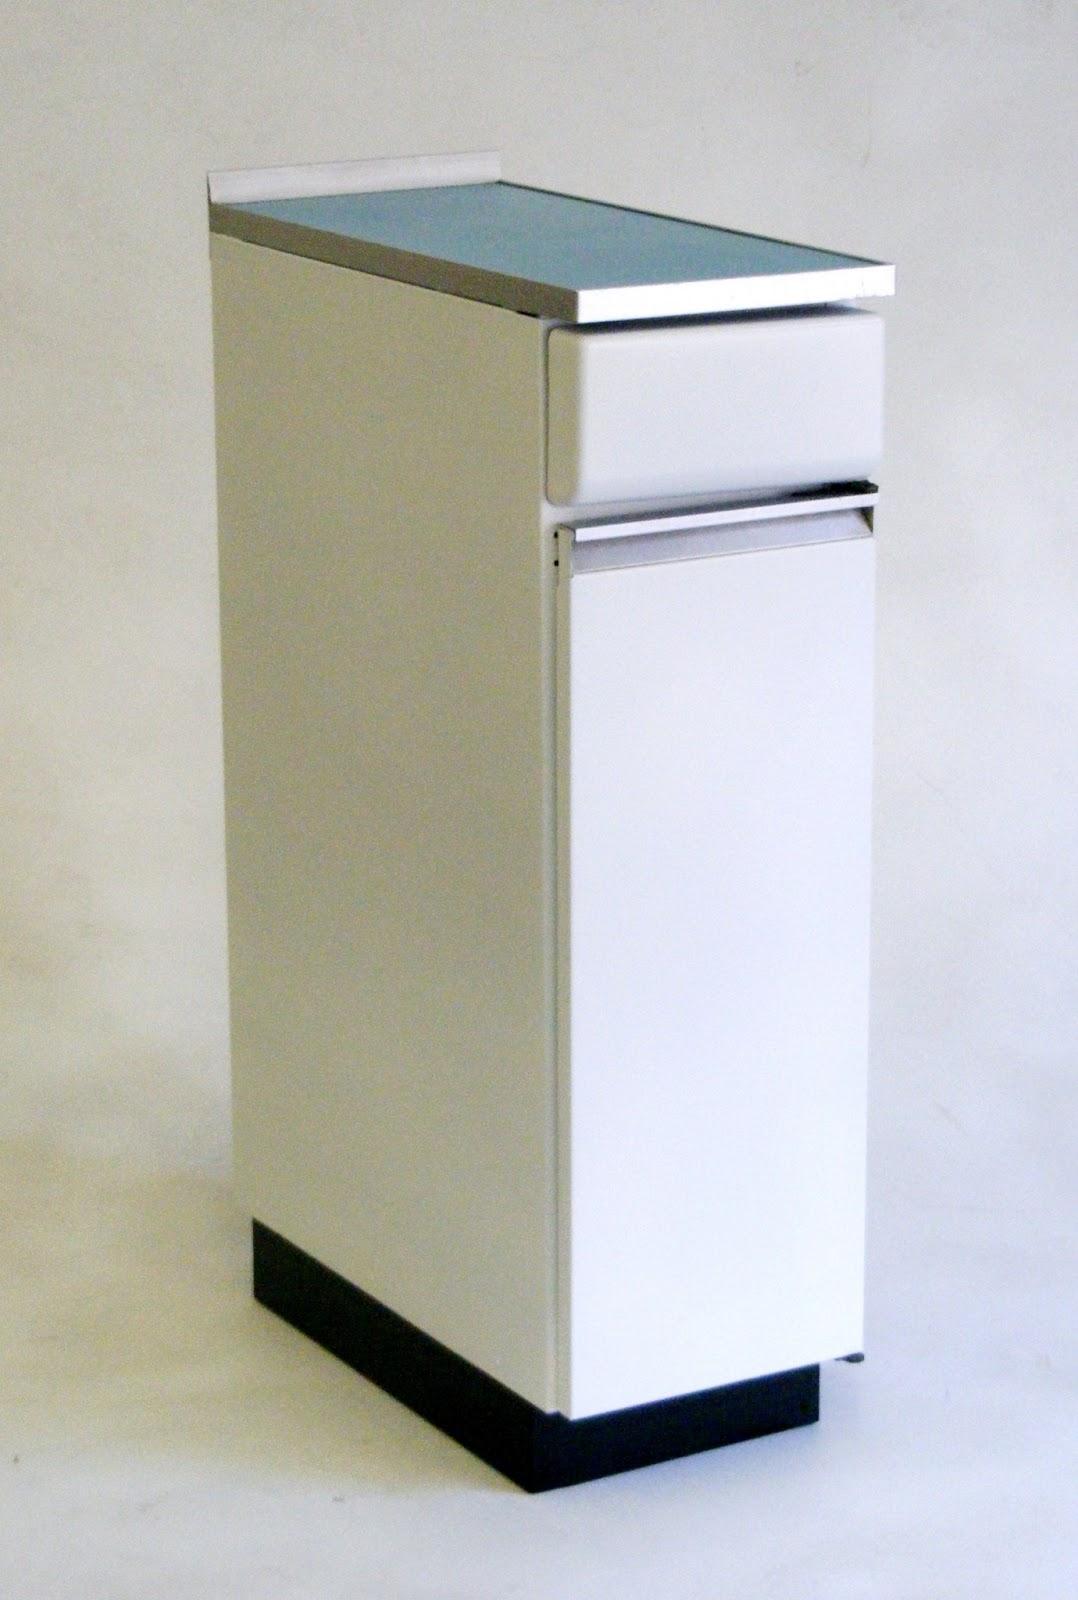 Vamp furniture new vintage furniture stock at vamp 31 for Slim depth kitchen units